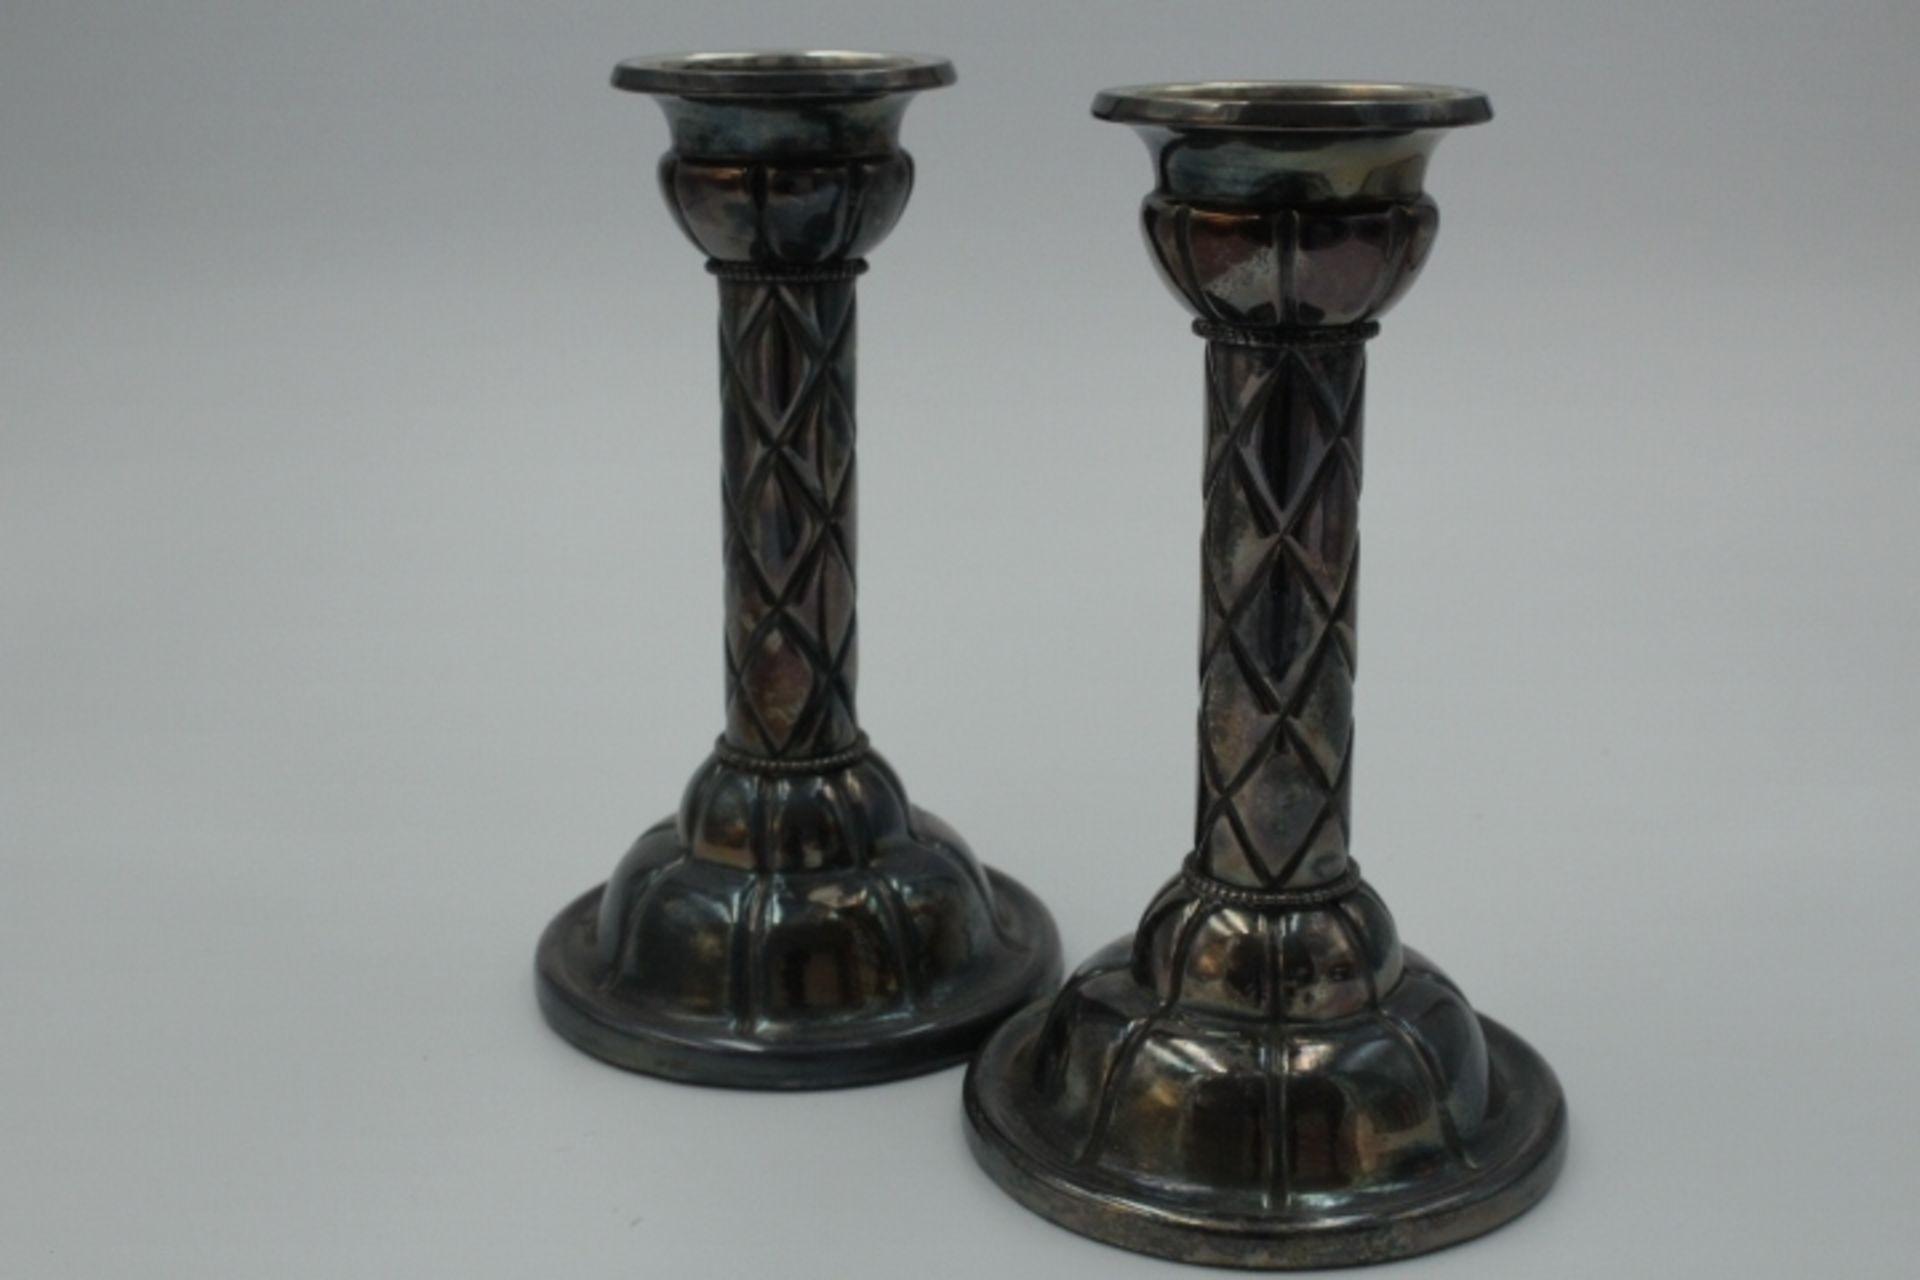 Paar Kerzenhalter Art-Deco Plated Marke » KZM « Höhe:21cm Im Stand gefüllt